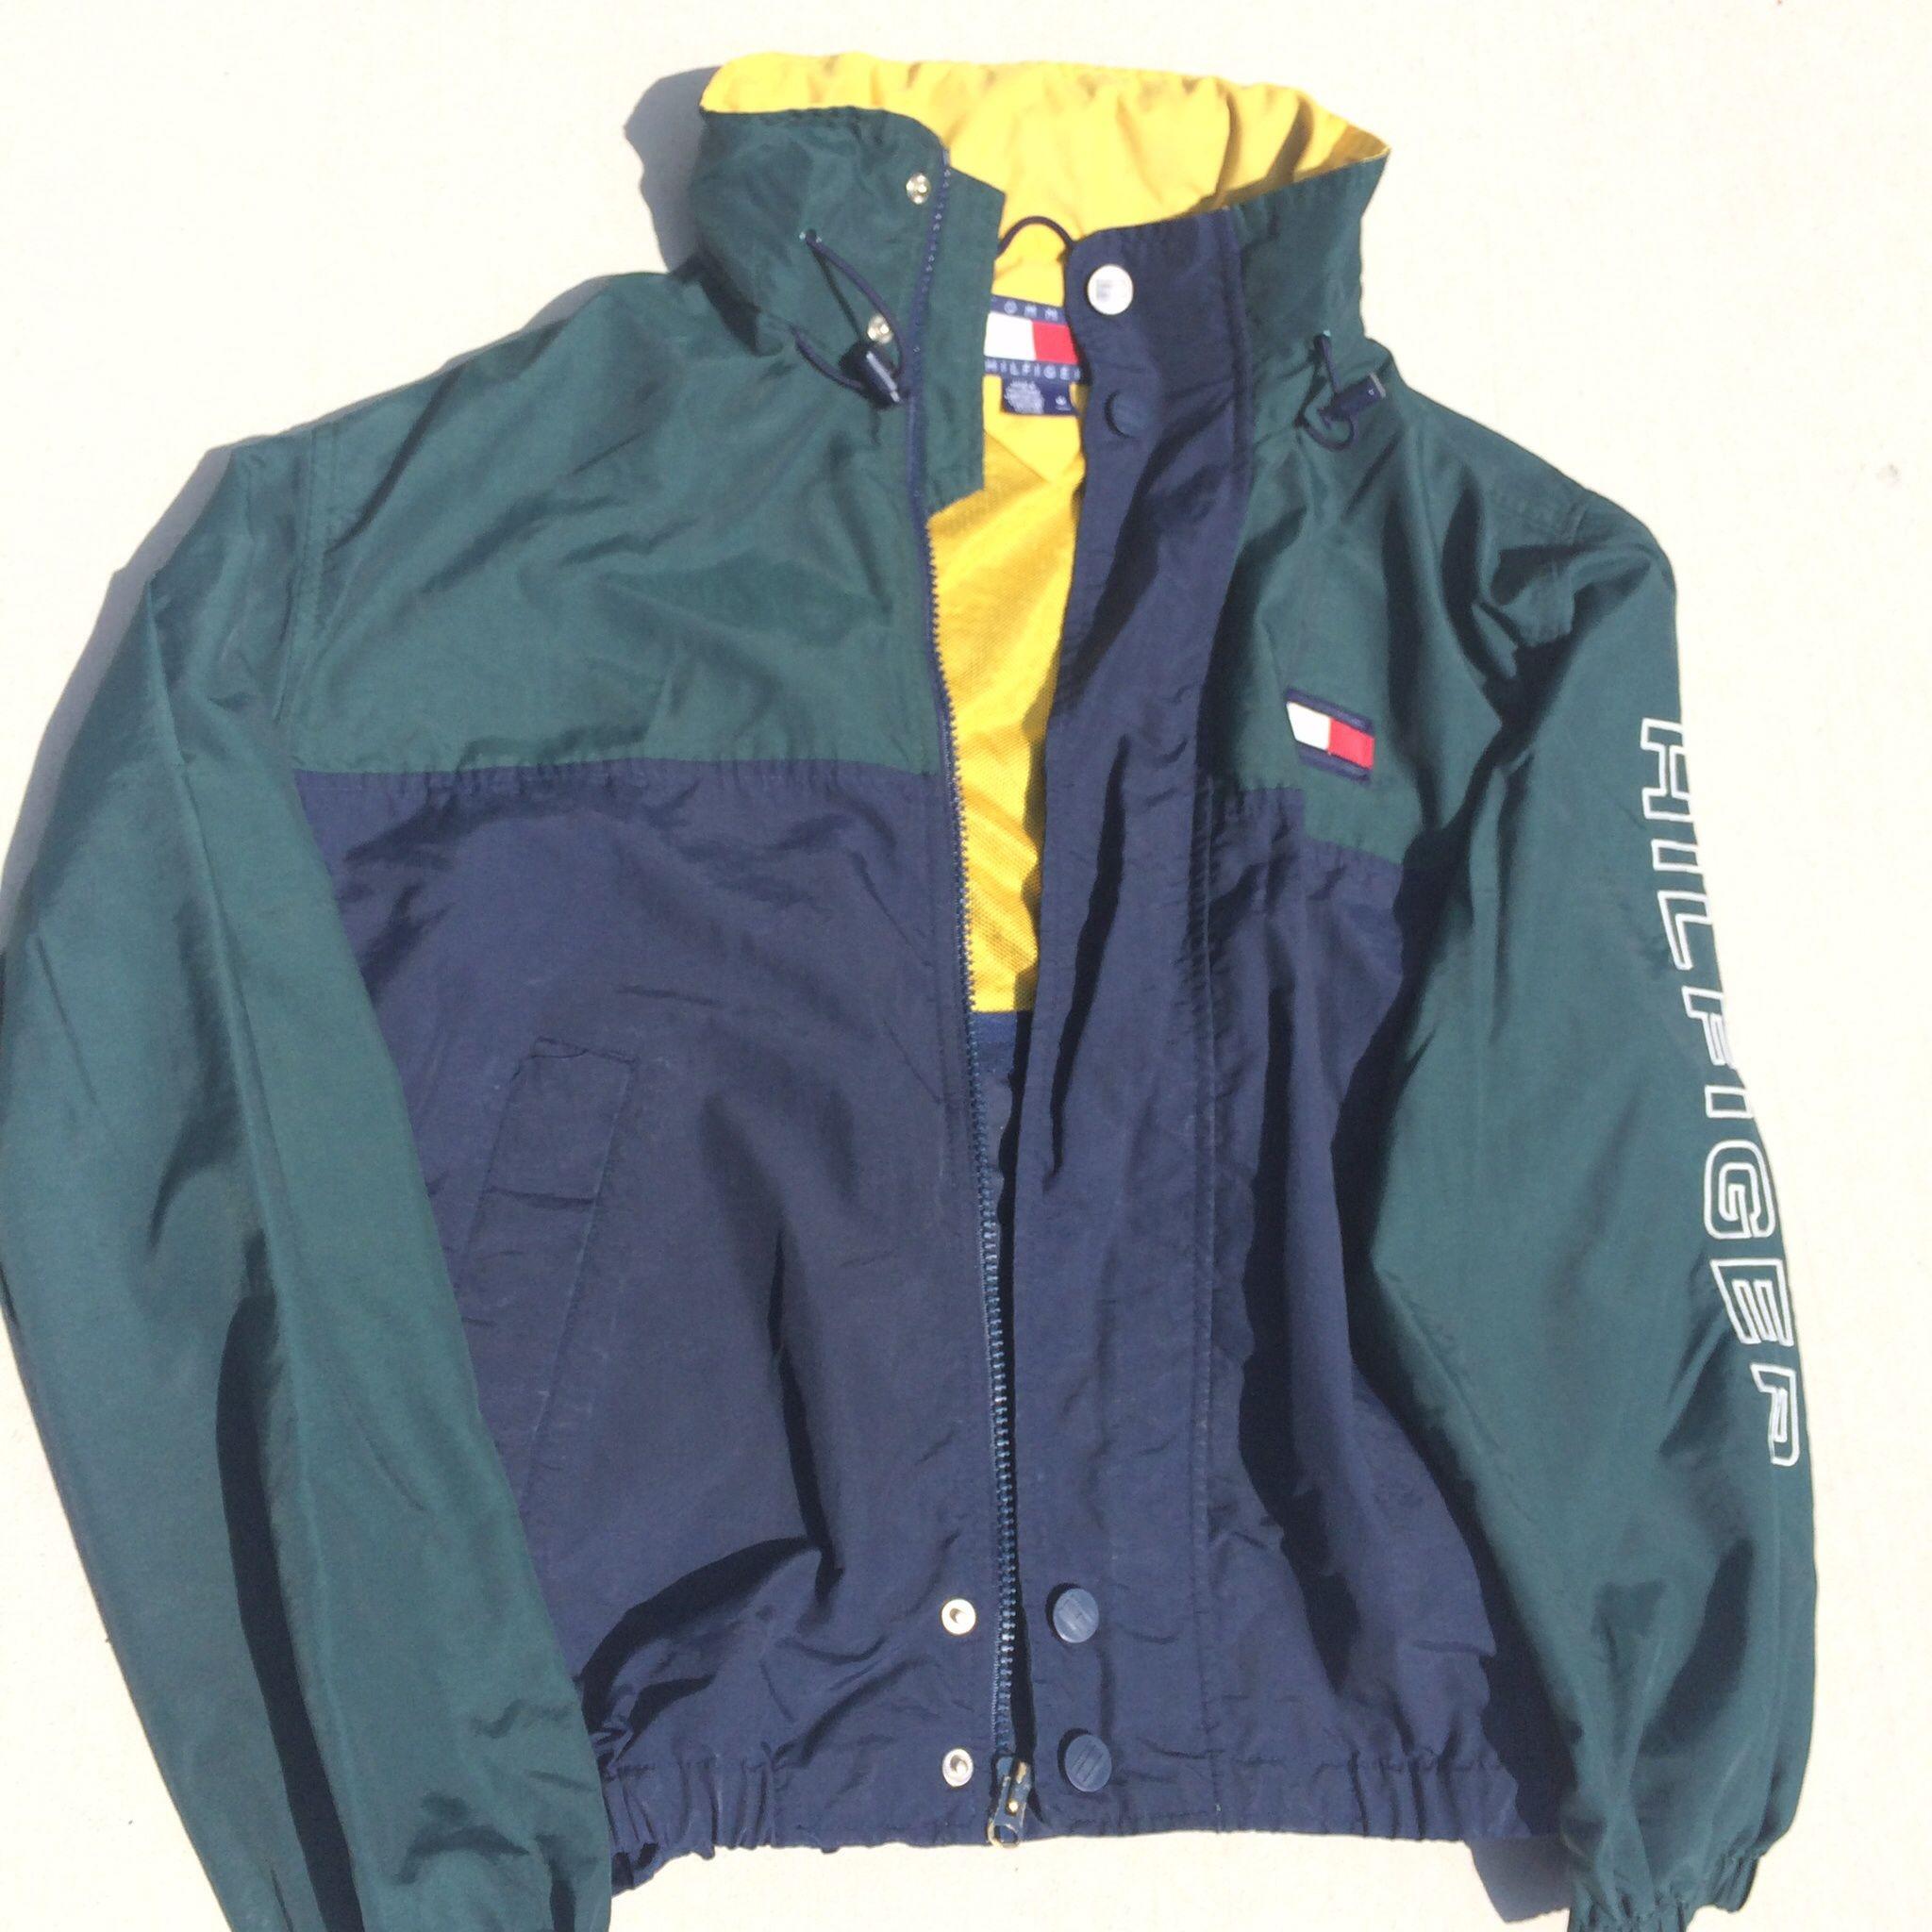 Sailing clothing sailing trousers amp shoes for men sailing clothes - Vintage Tommy Hilfiger Sailing Windbreaker Jacket